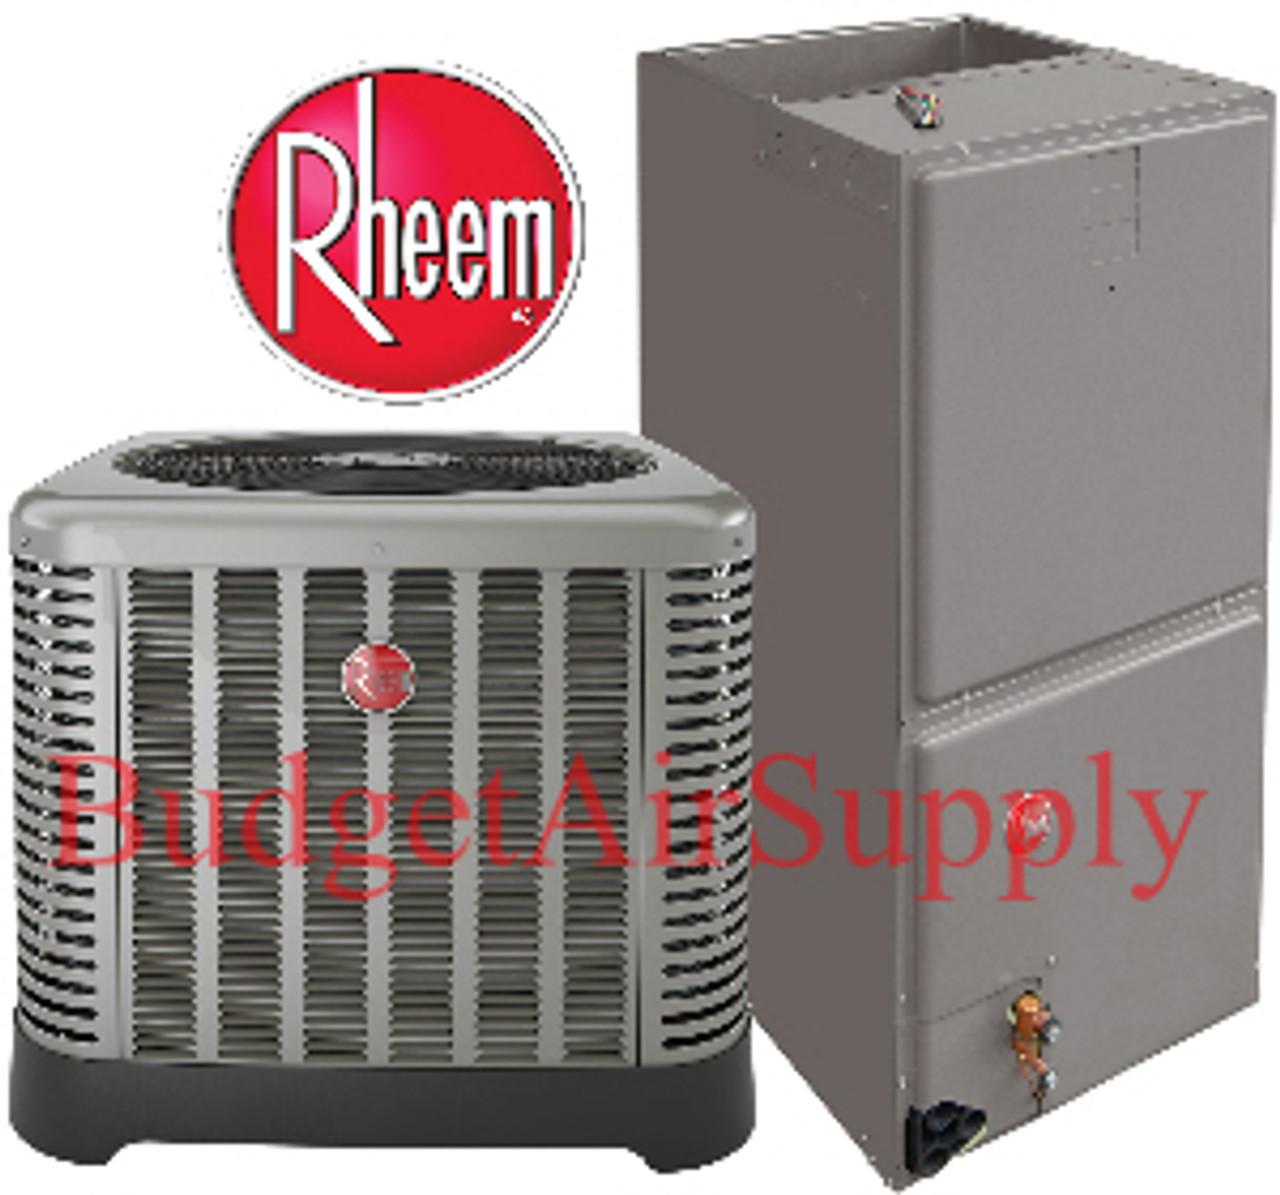 Ruud Heat Pump Thermostat Wiring